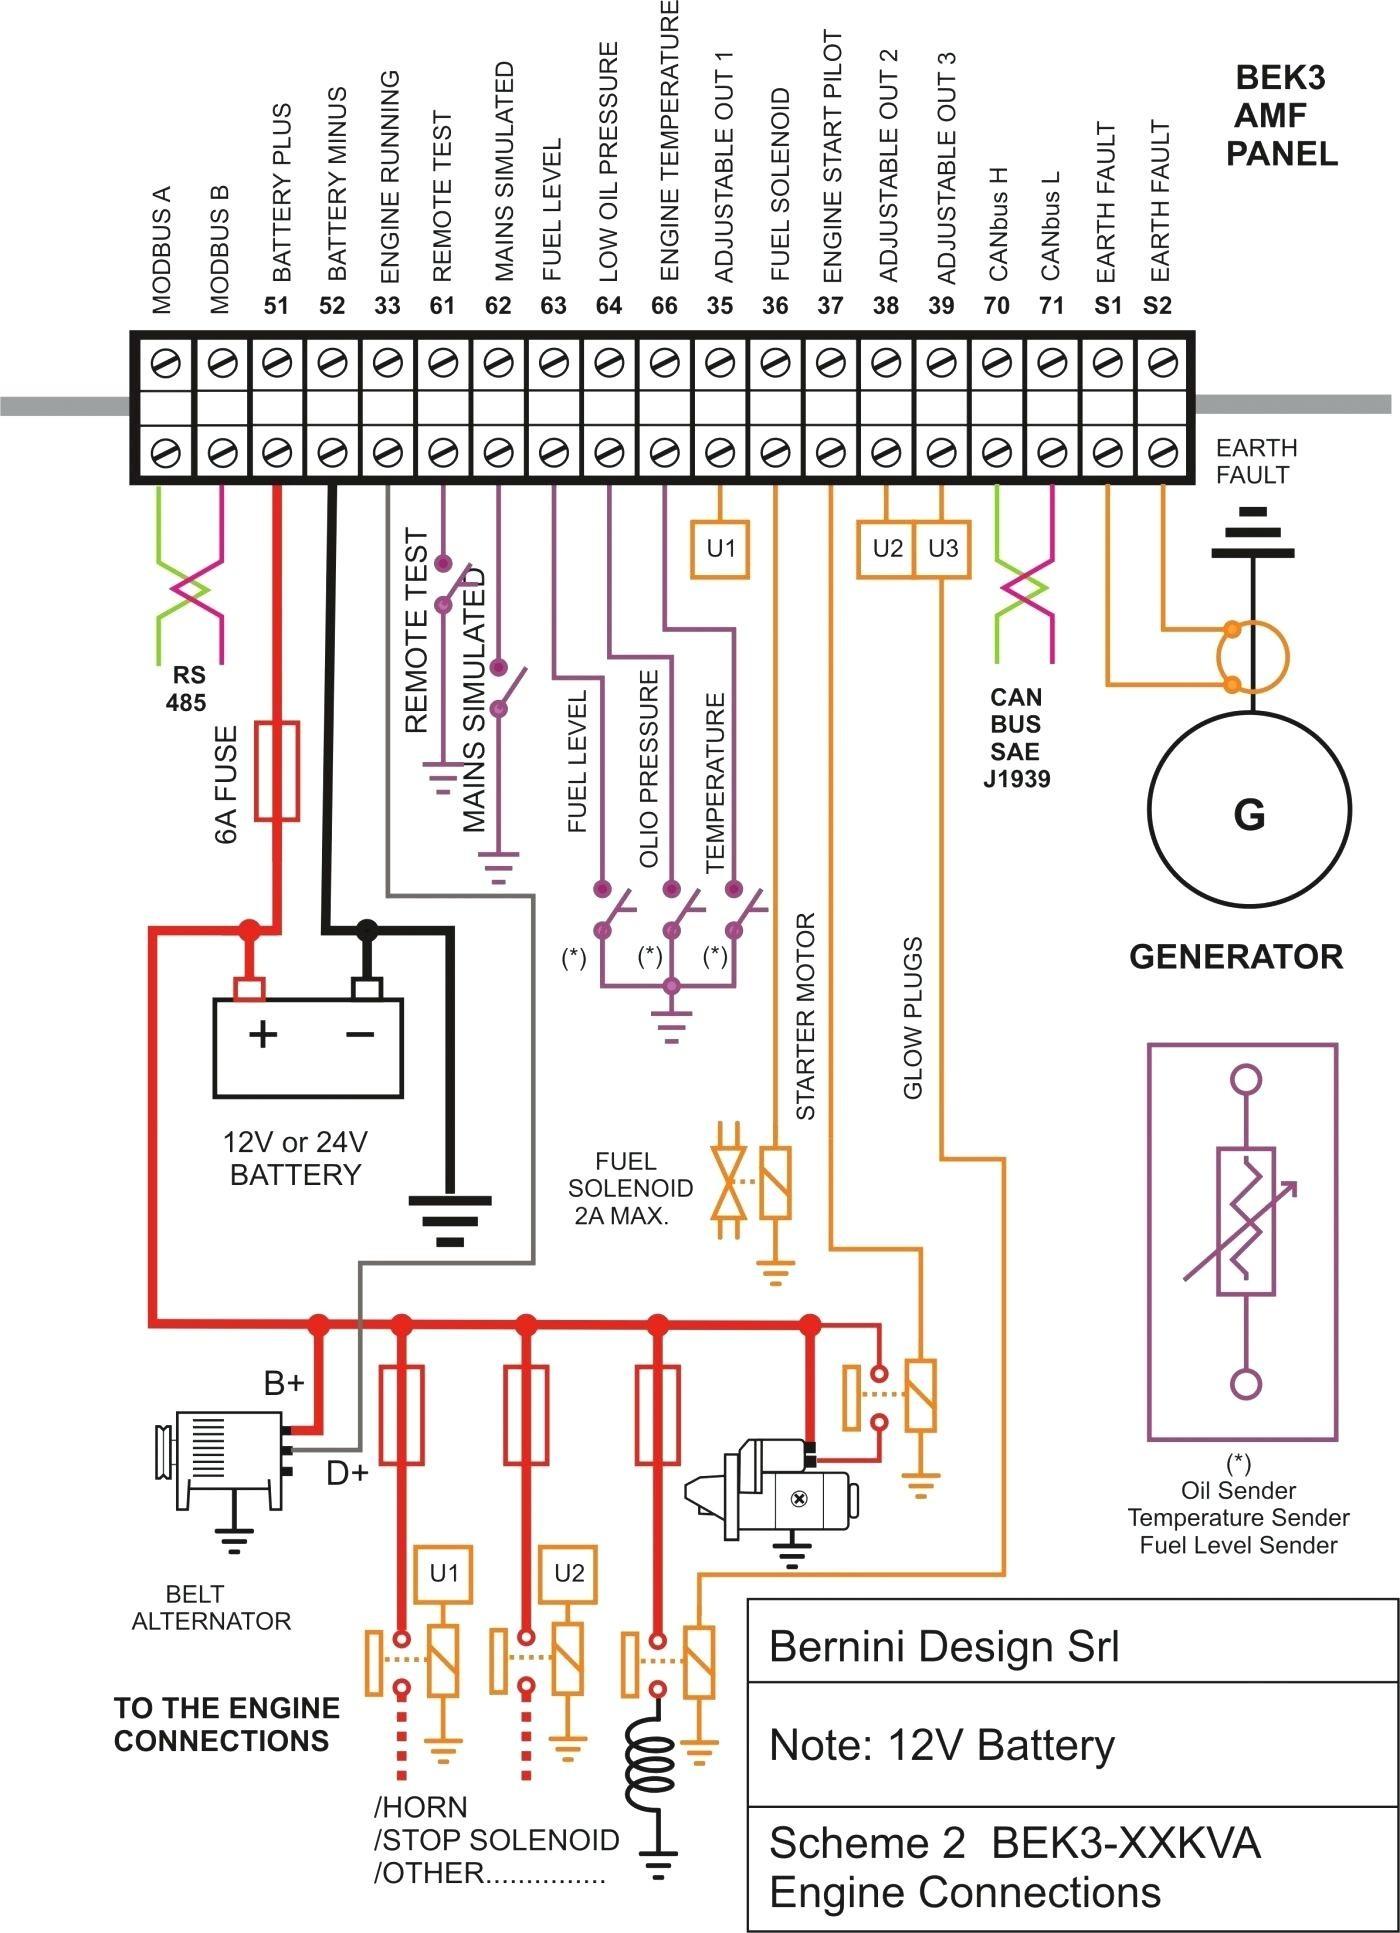 Home Generator Transfer Switch Wiring Diagram Wiring Diagram Home Generator & Installing A Generator with An Of Home Generator Transfer Switch Wiring Diagram